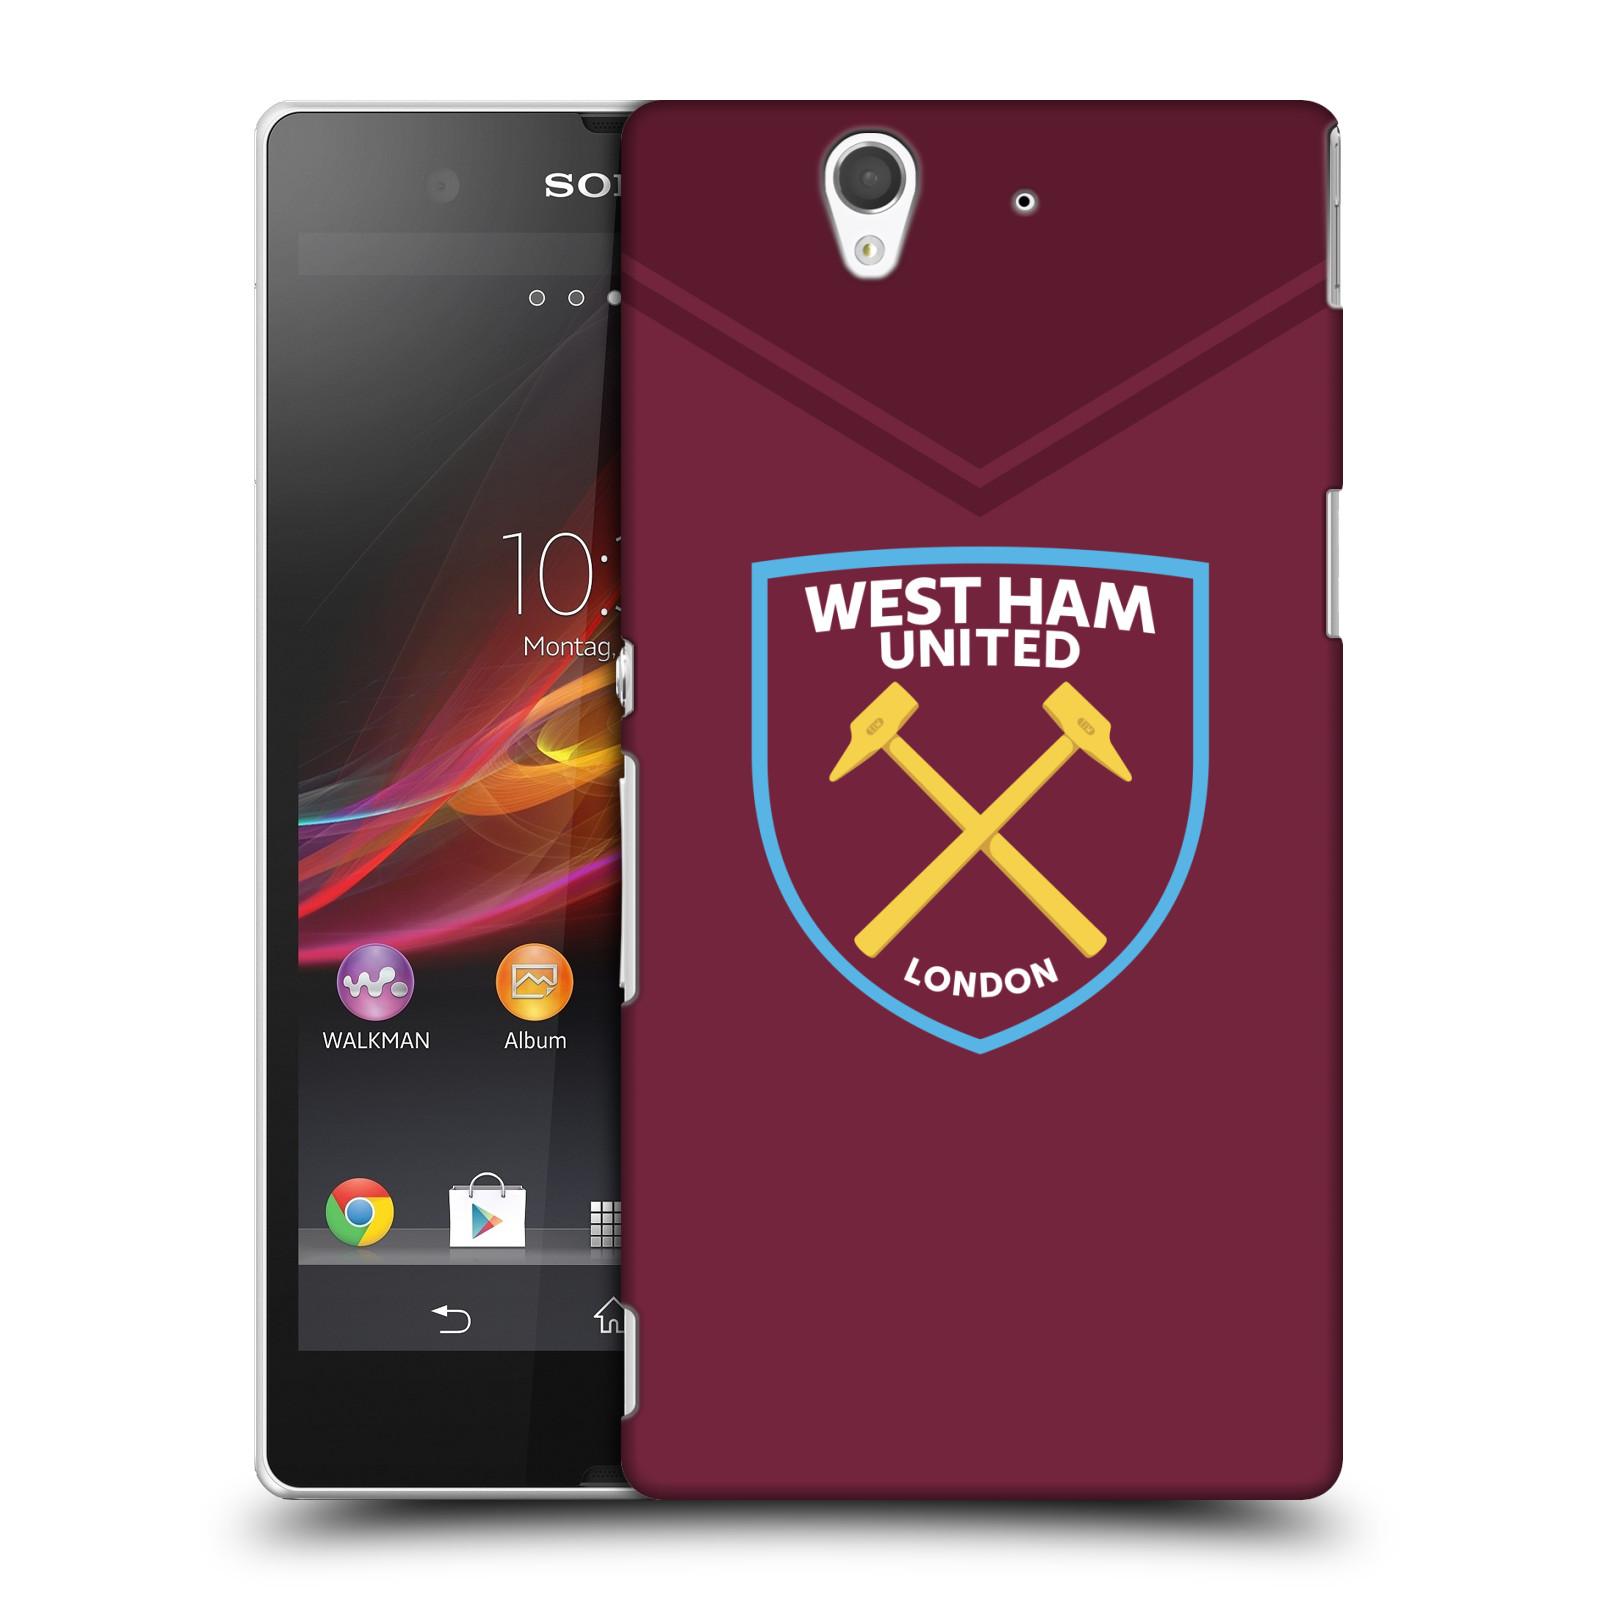 Plastové pouzdro na mobil Sony Xperia Z C6603 - Head Case - West Ham United - Logo